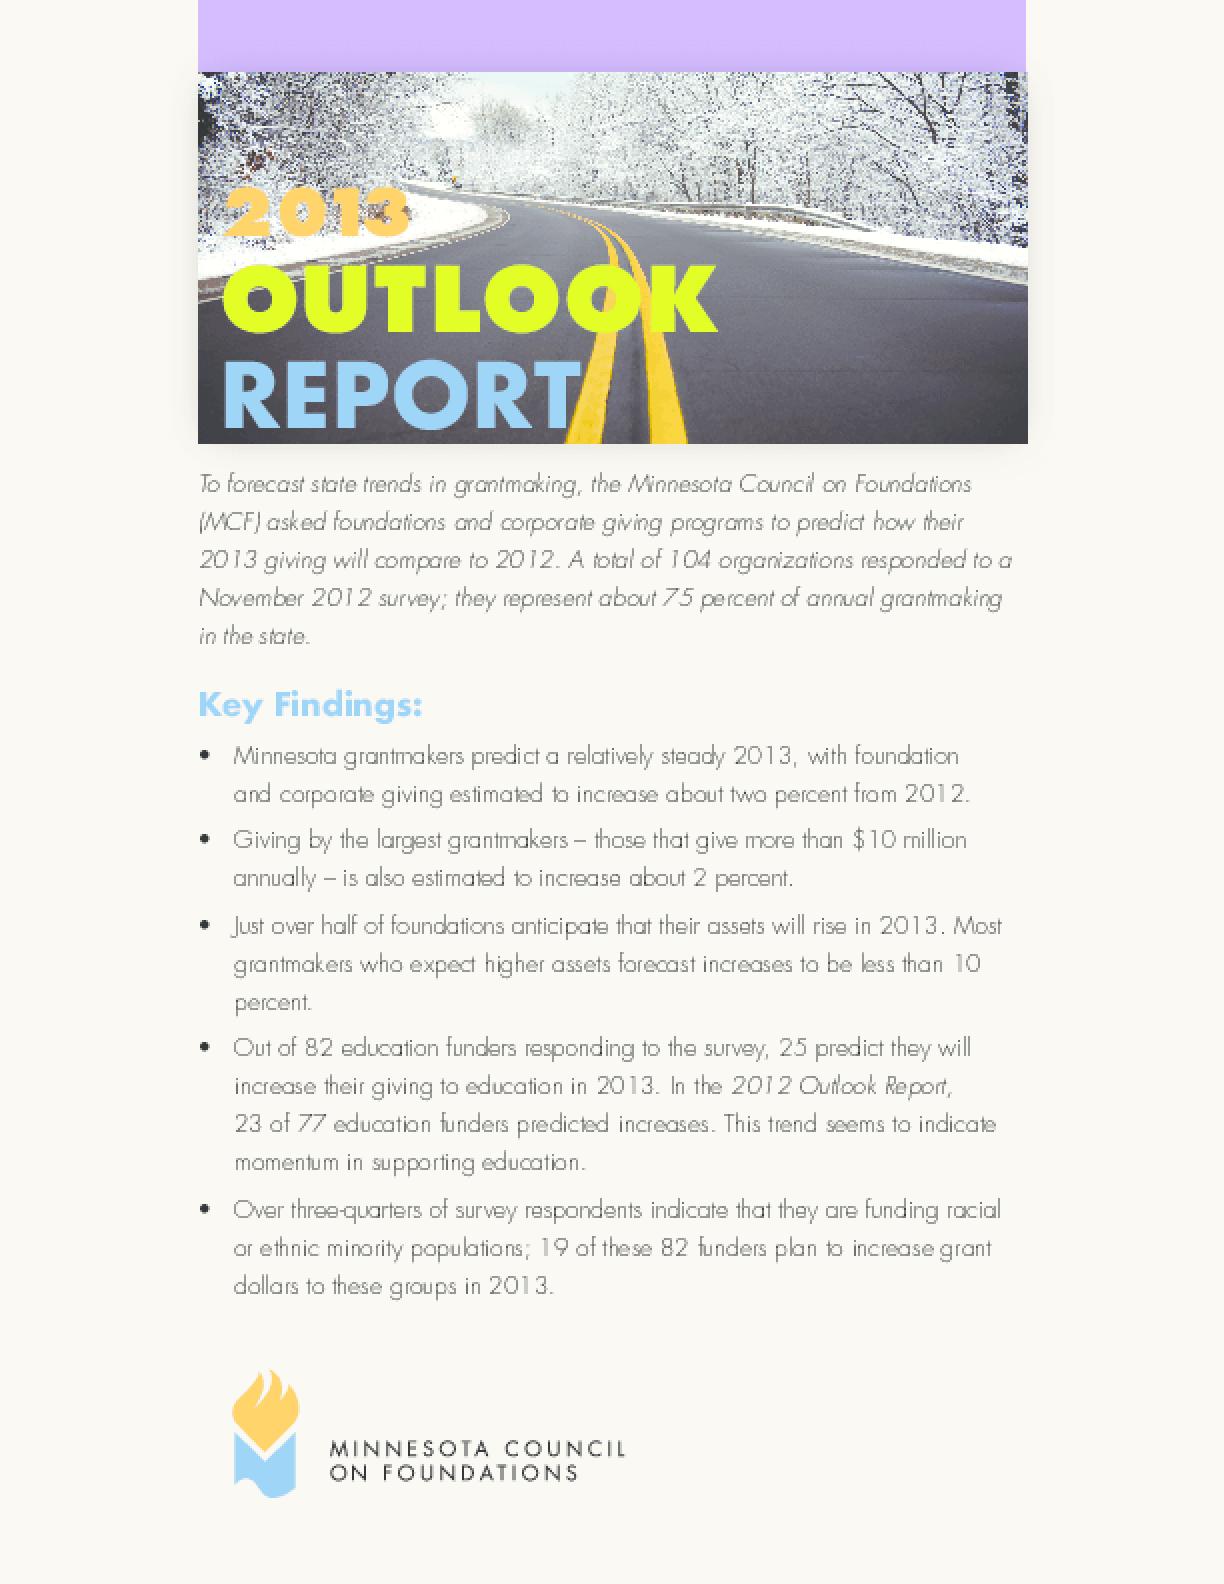 2013 Outlook Report